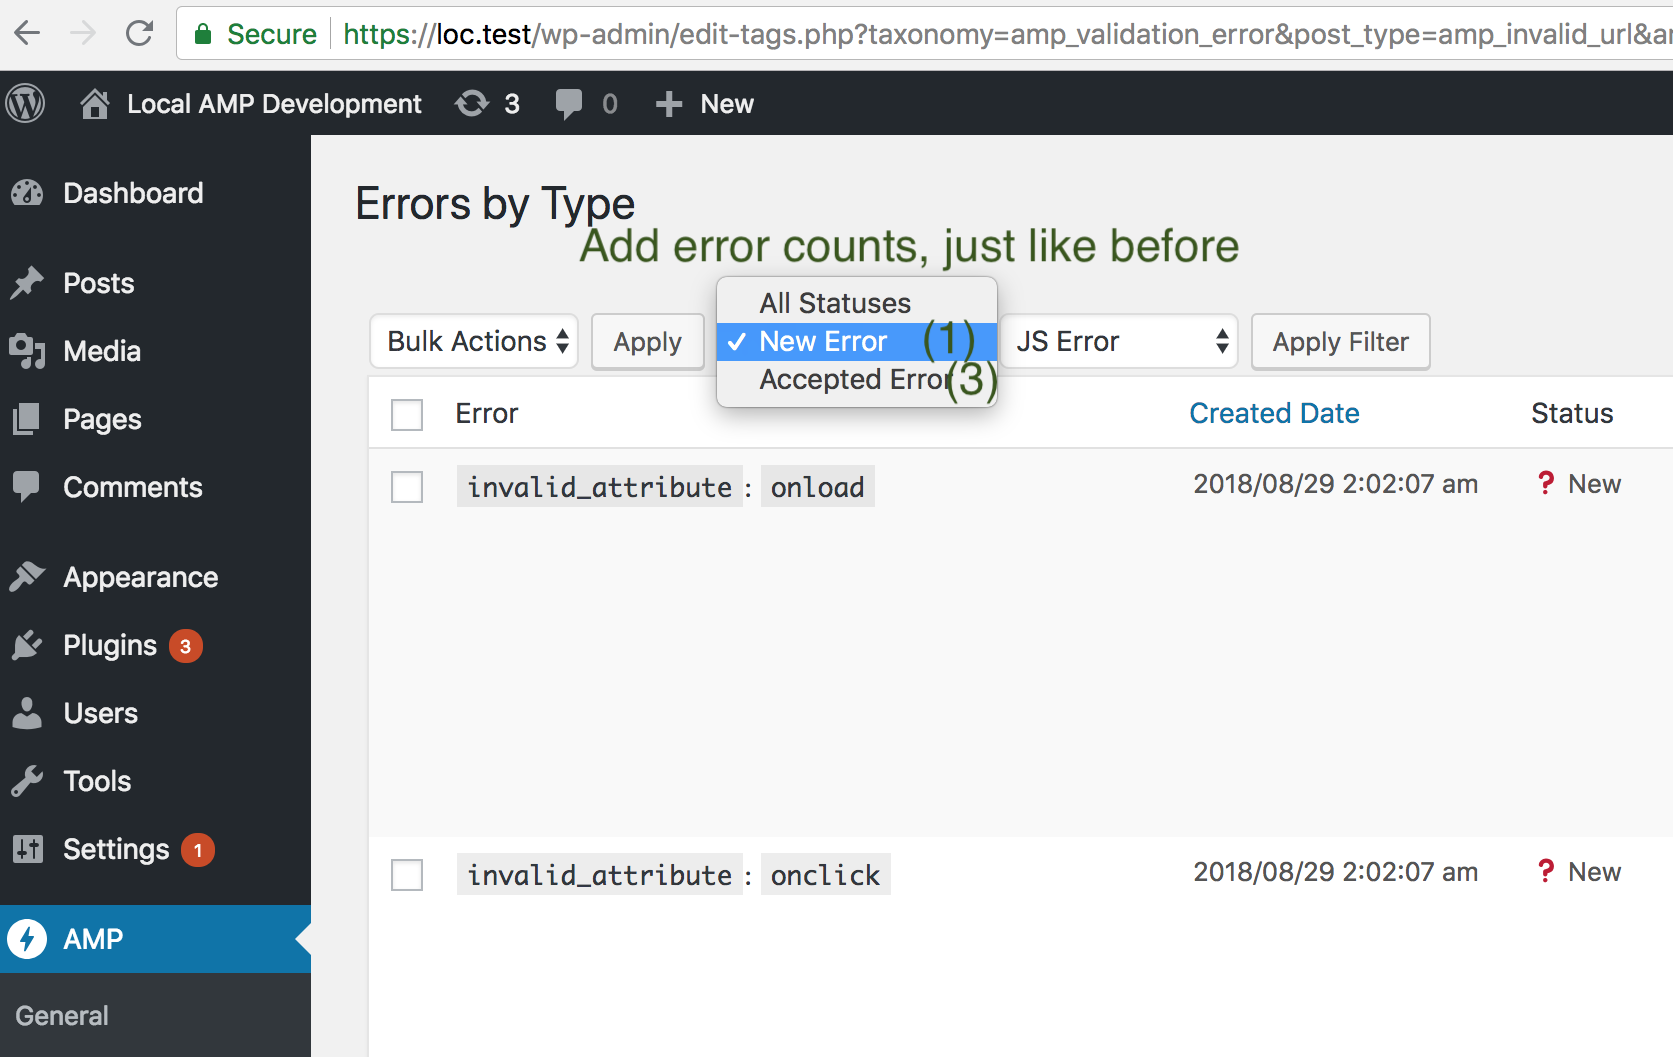 add-error-counts